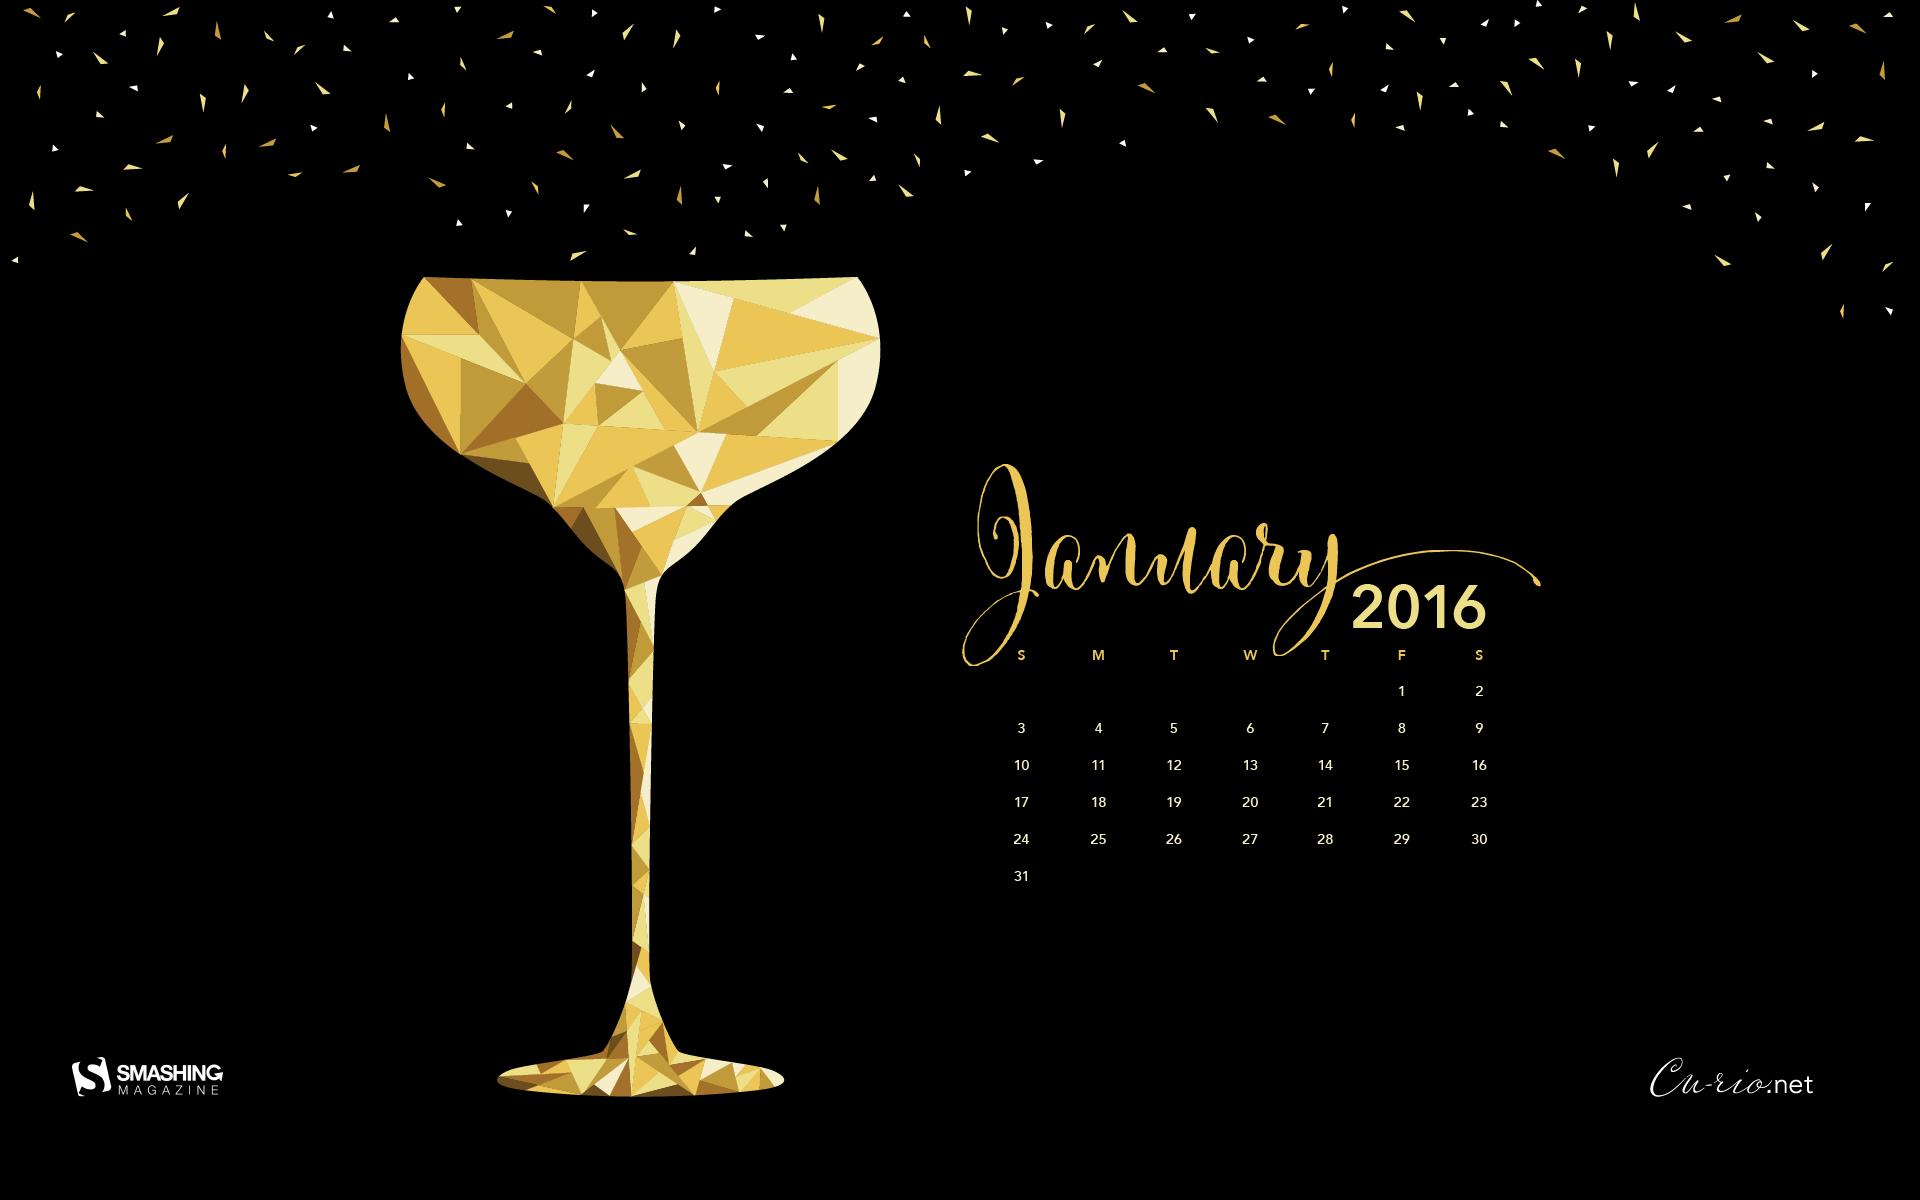 Desktop Wallpaper Calendars January 2016 Smashing Magazine 1920x1200